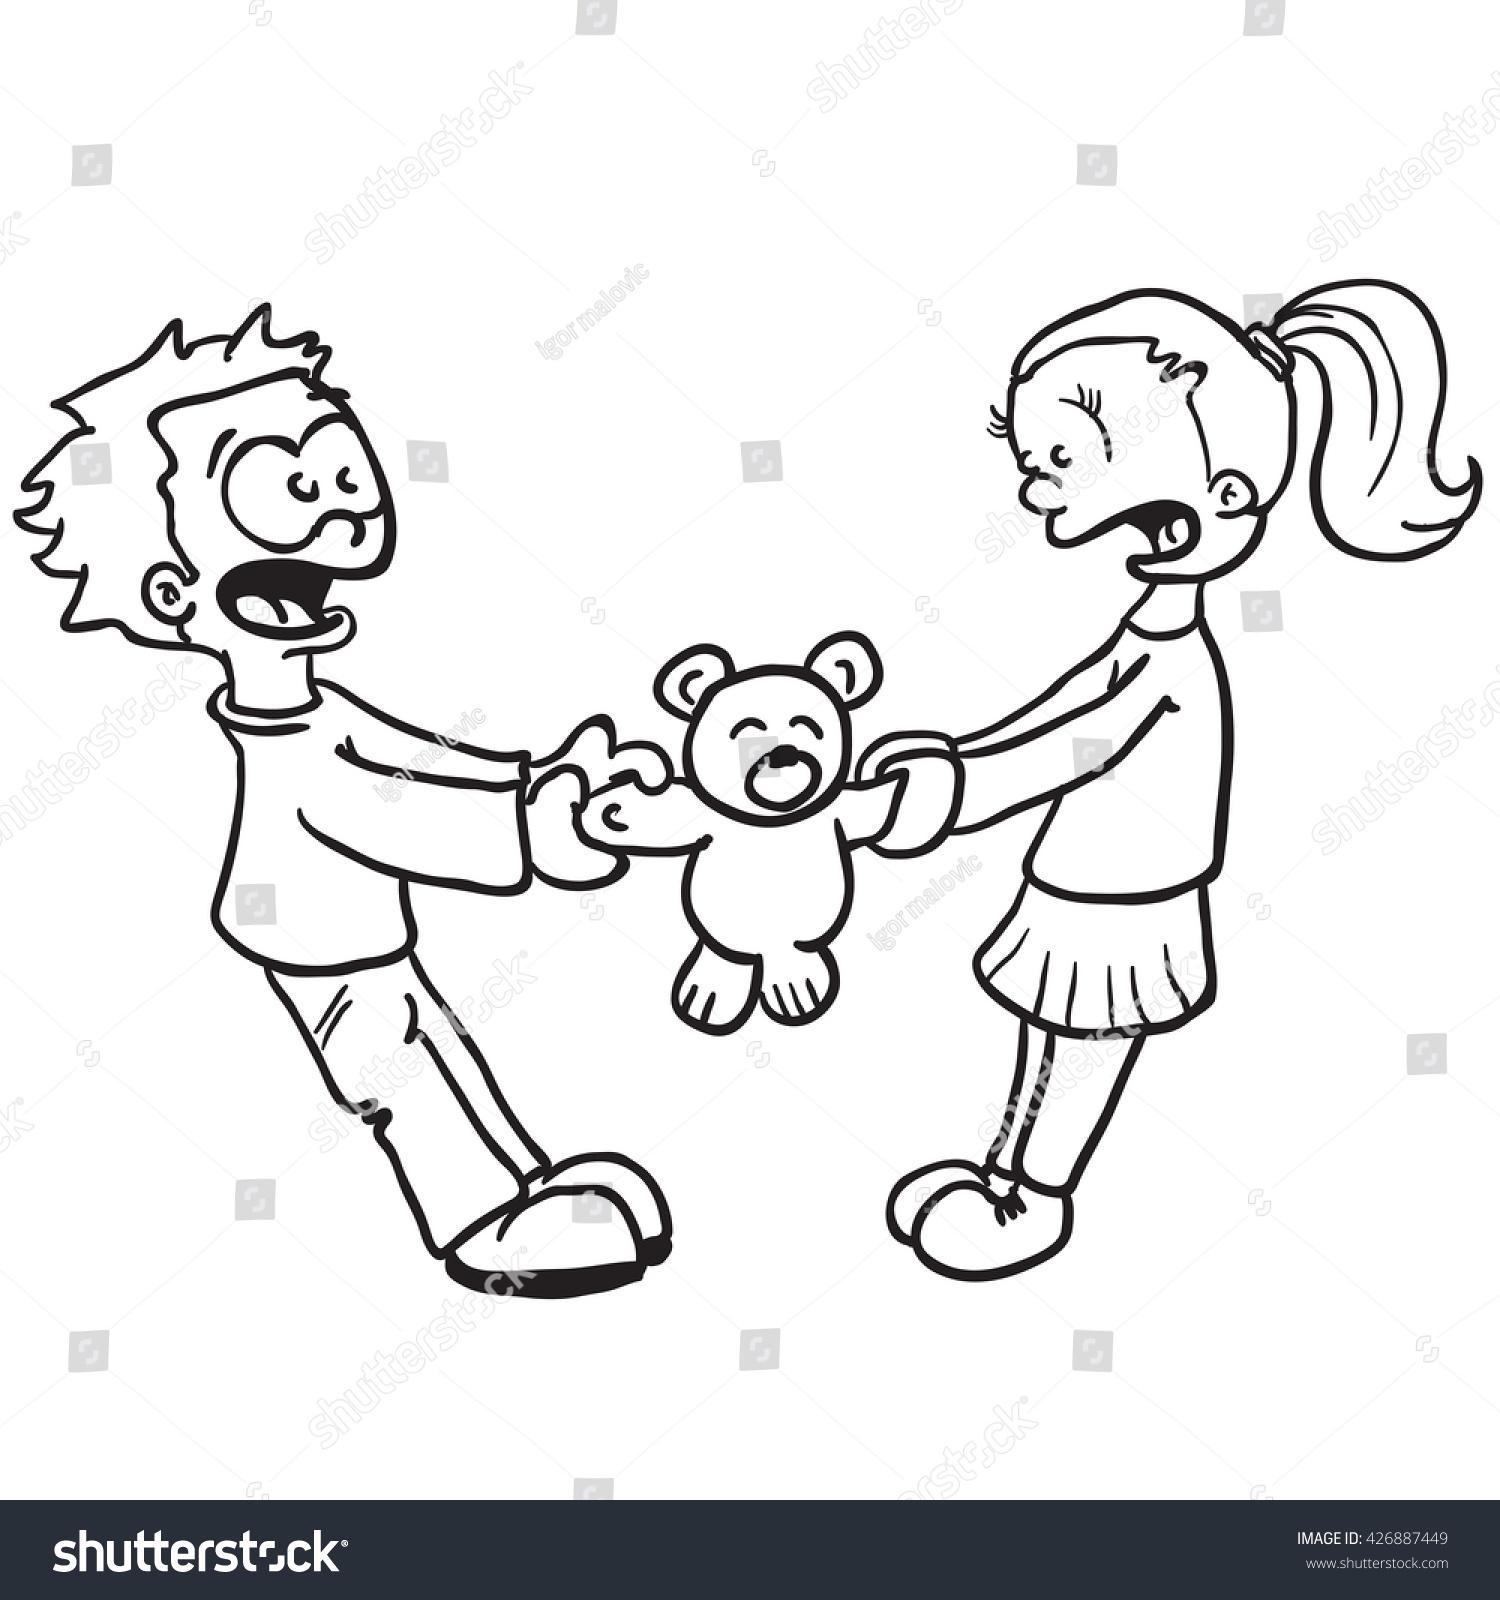 Black White Boy Girl Fighting Cartoon Stock Vector